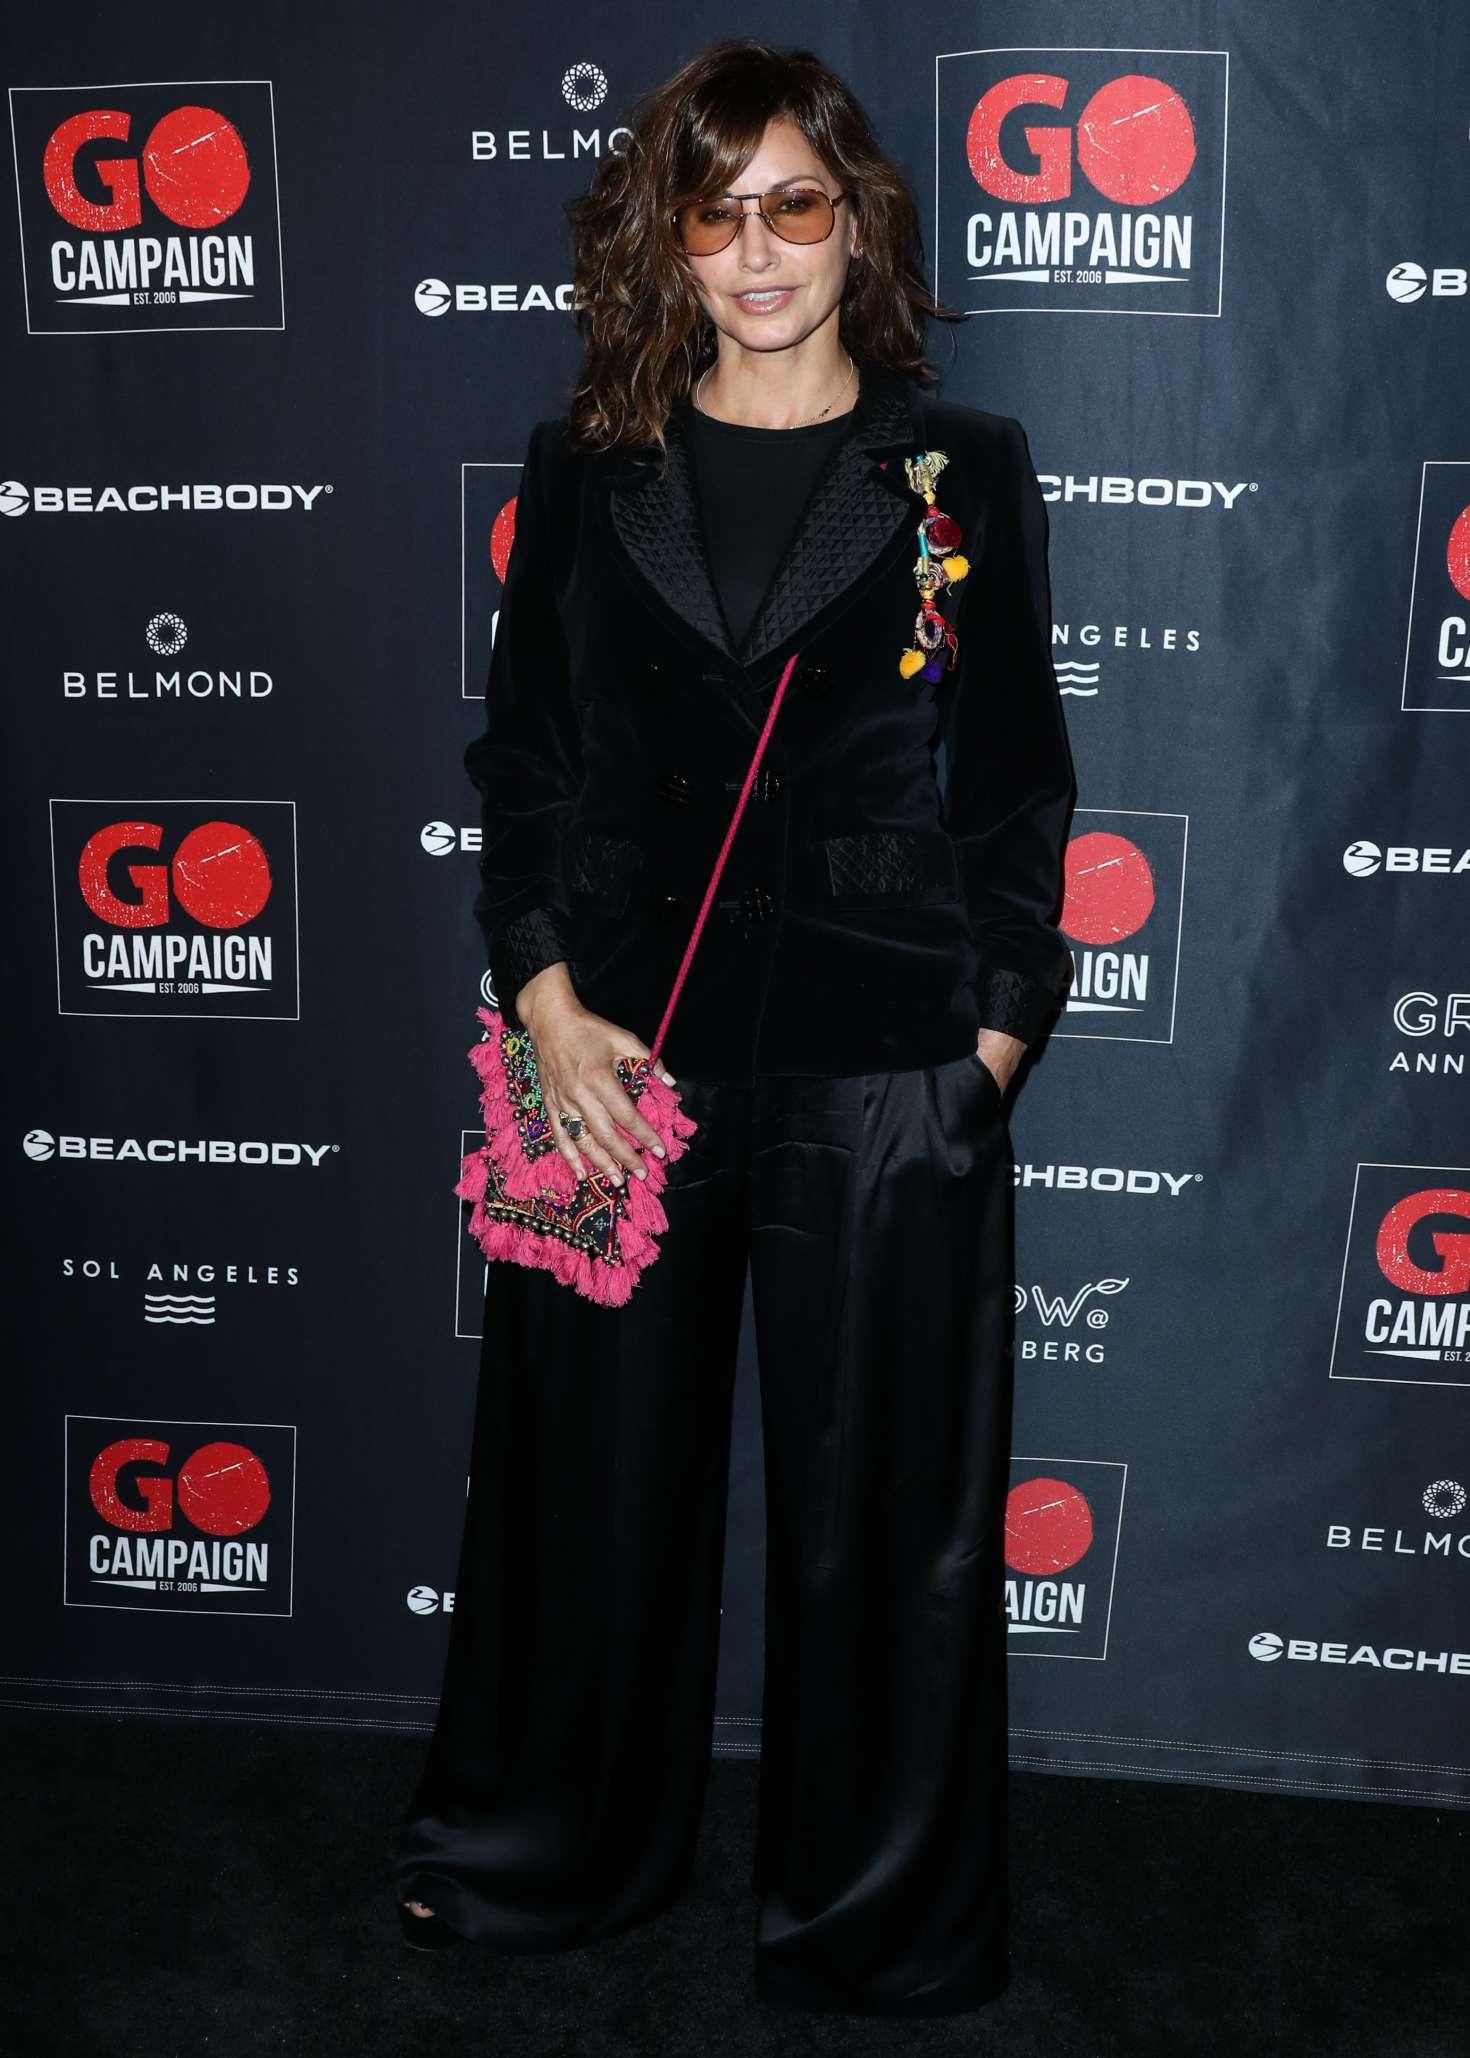 Gina Gershon 2018 : Gina Gershon: 2018 GO Campaign Gala -09